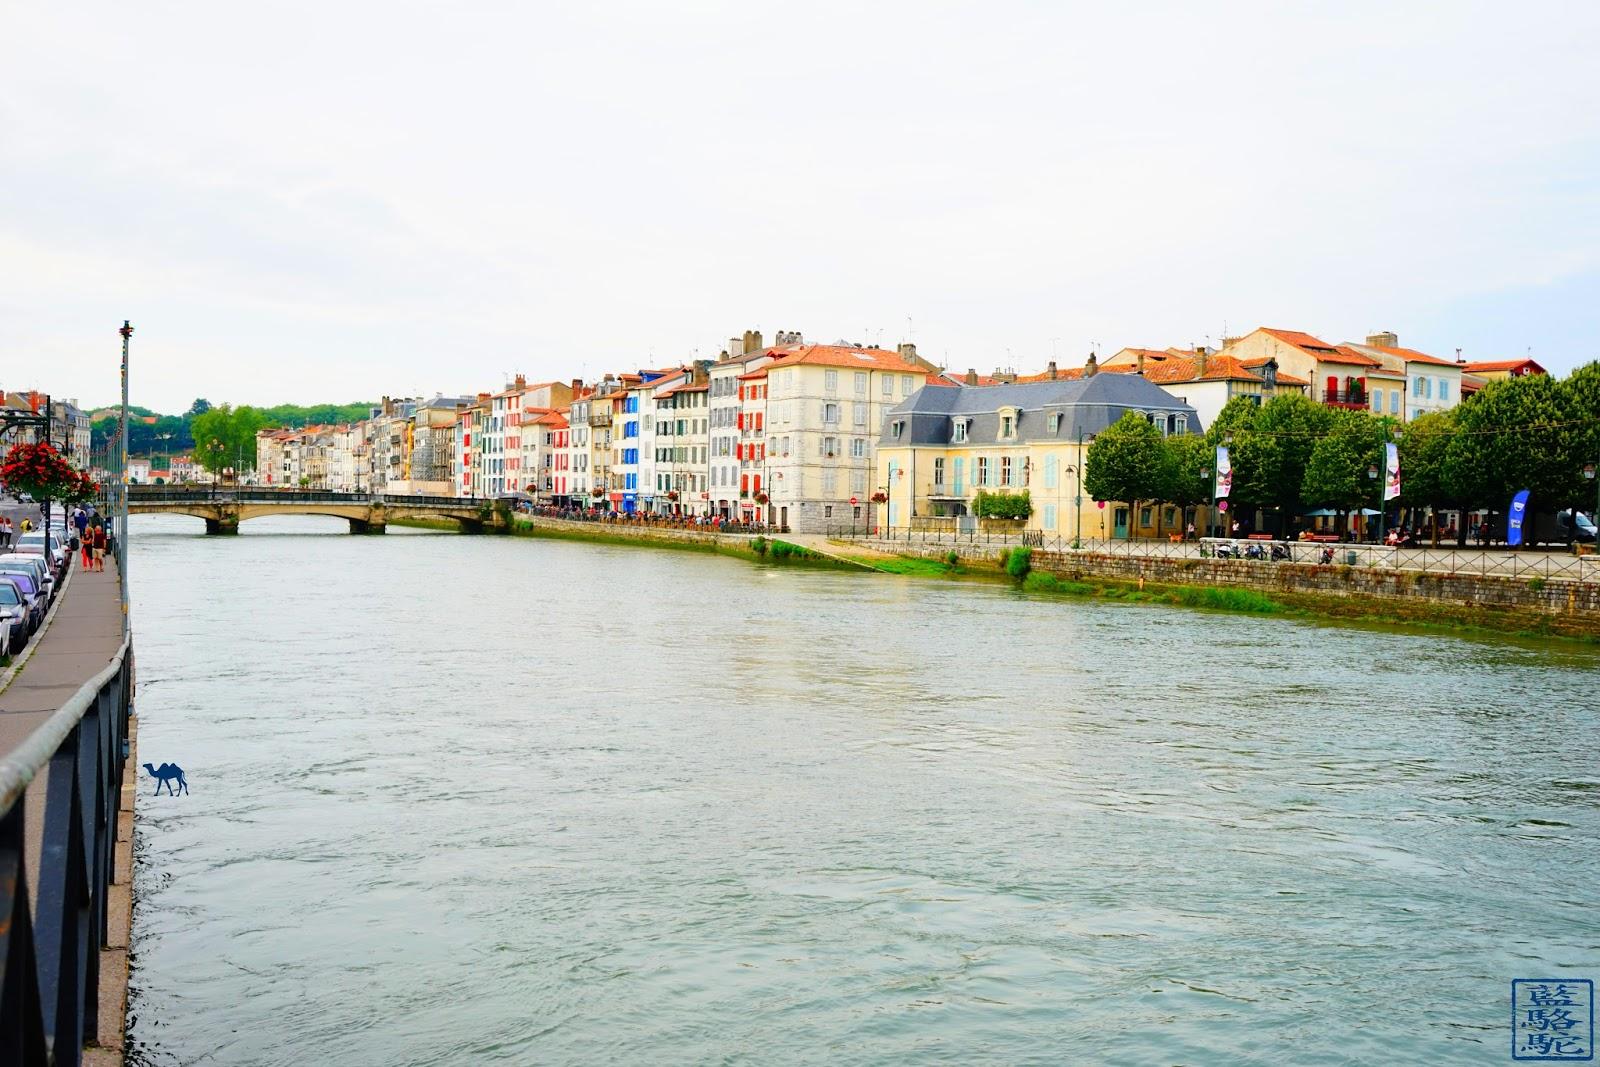 Le Chameau Bleu -Blog Voyage Bayonne France - La NIve à  Bayonne - Pays Basque